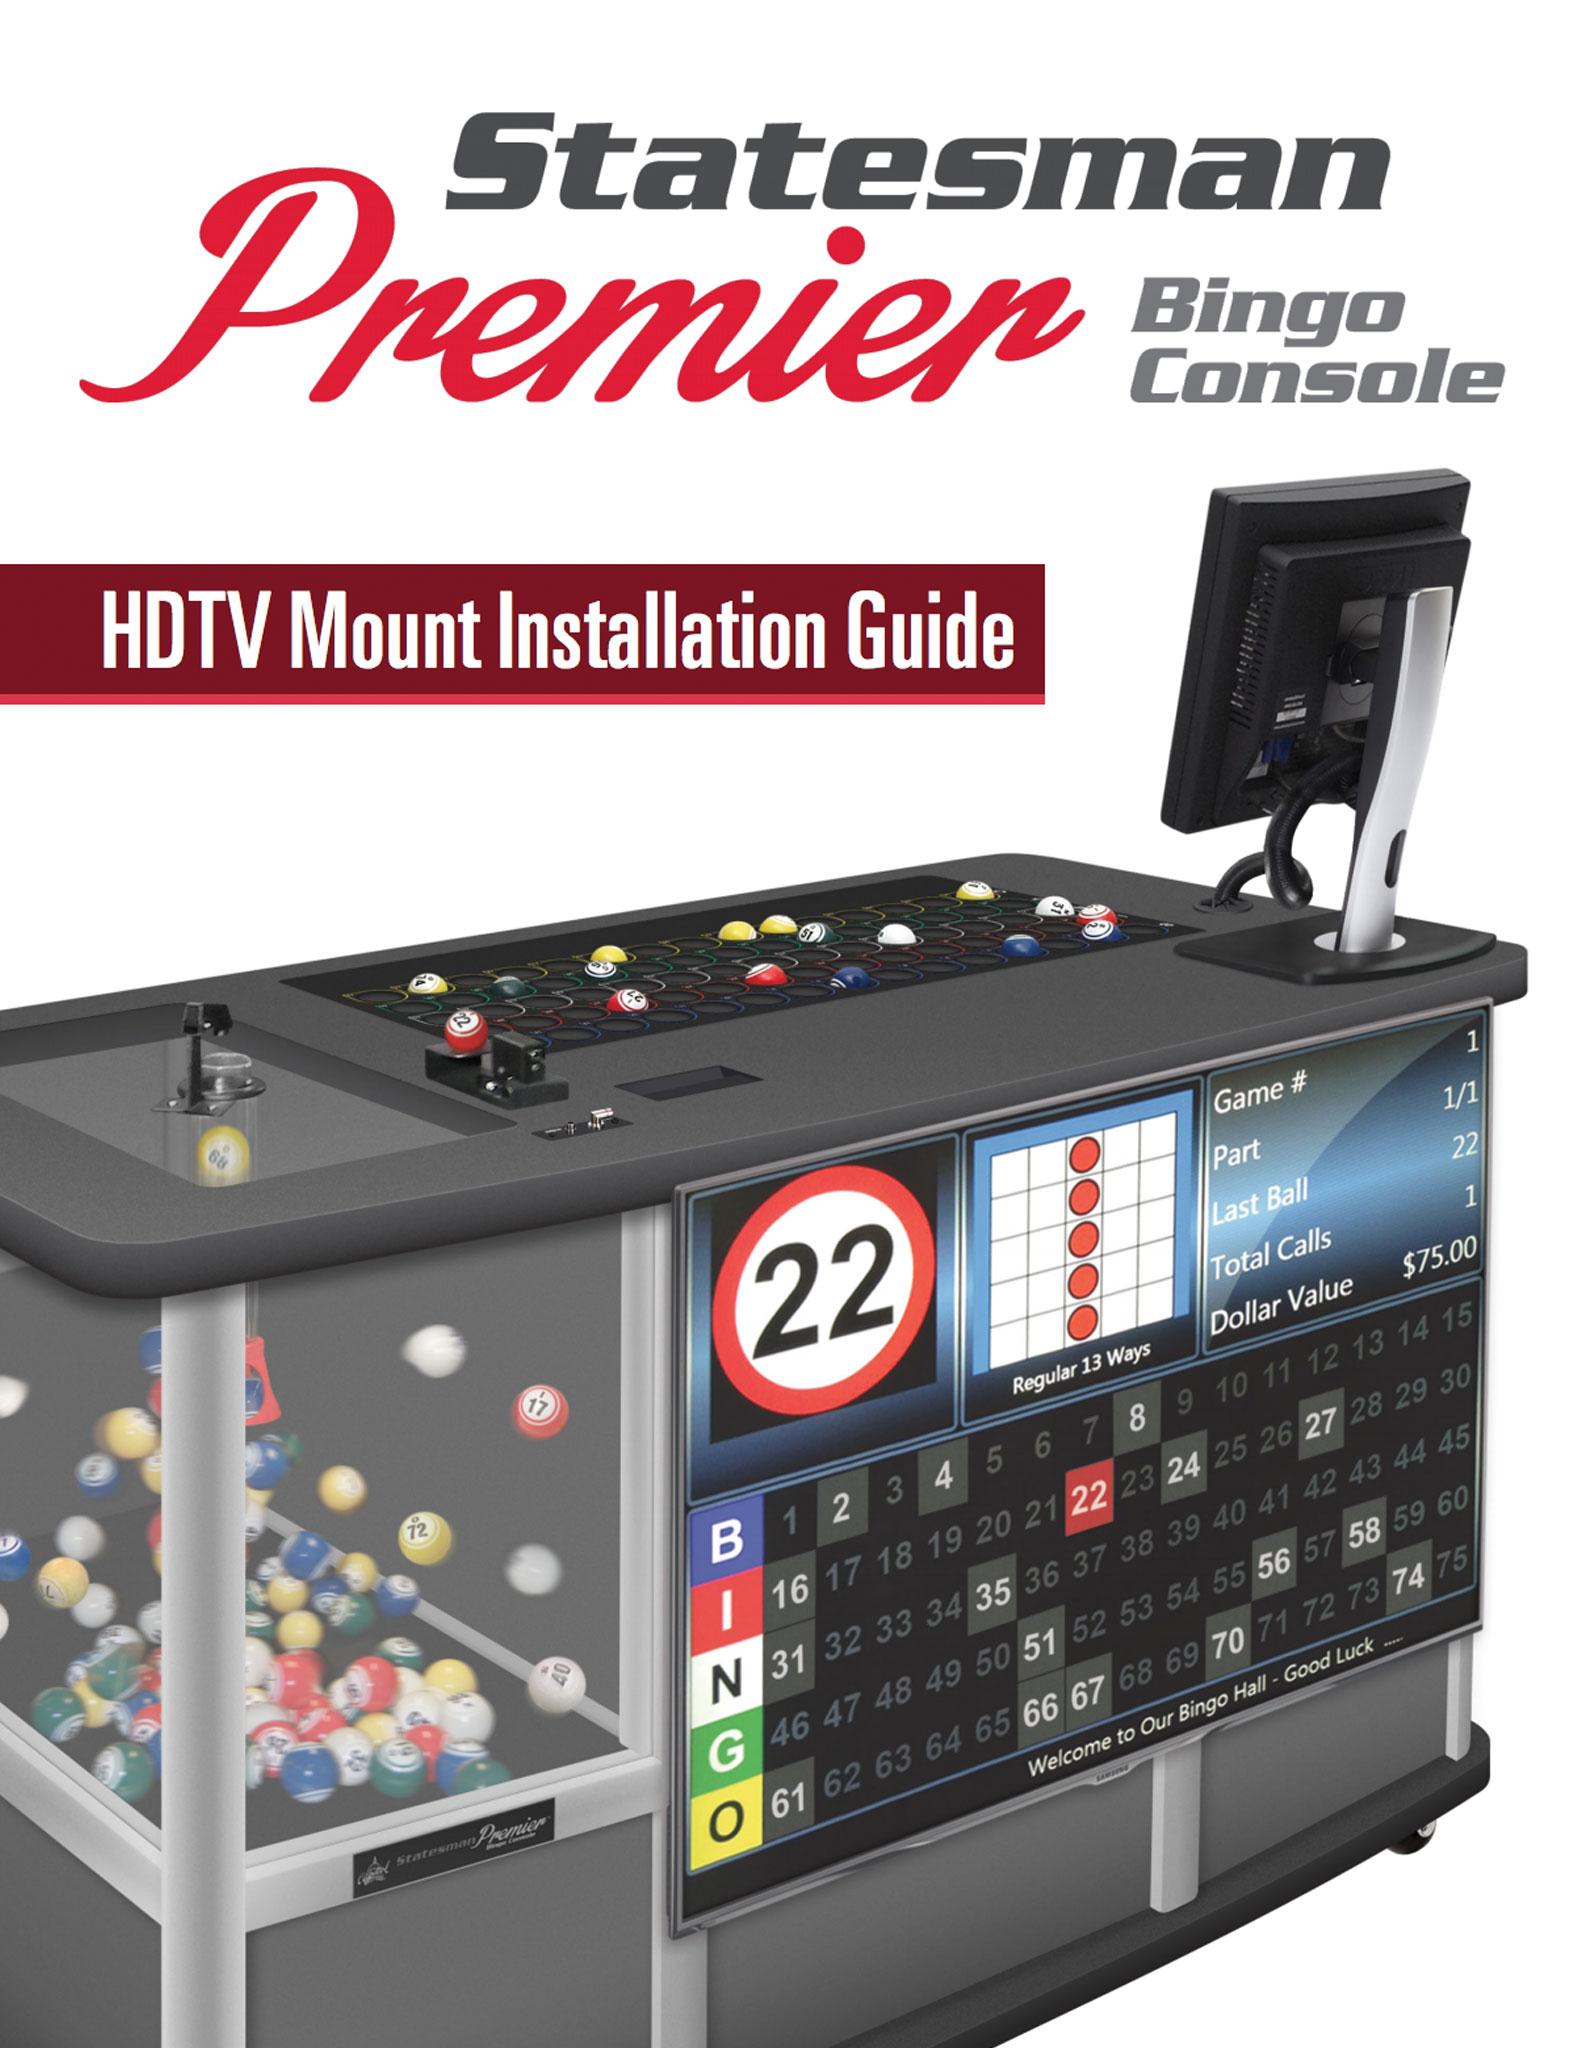 Statesman Premier HDTV Mount Install Guide Equipment Manuals/Quick Start Guides